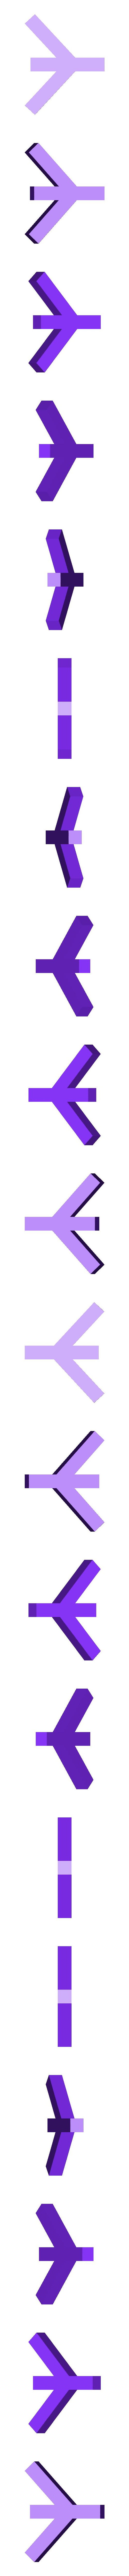 WakandaFont-Y.stl Download free STL file Wakandan Font • Model to 3D print, hterefenko